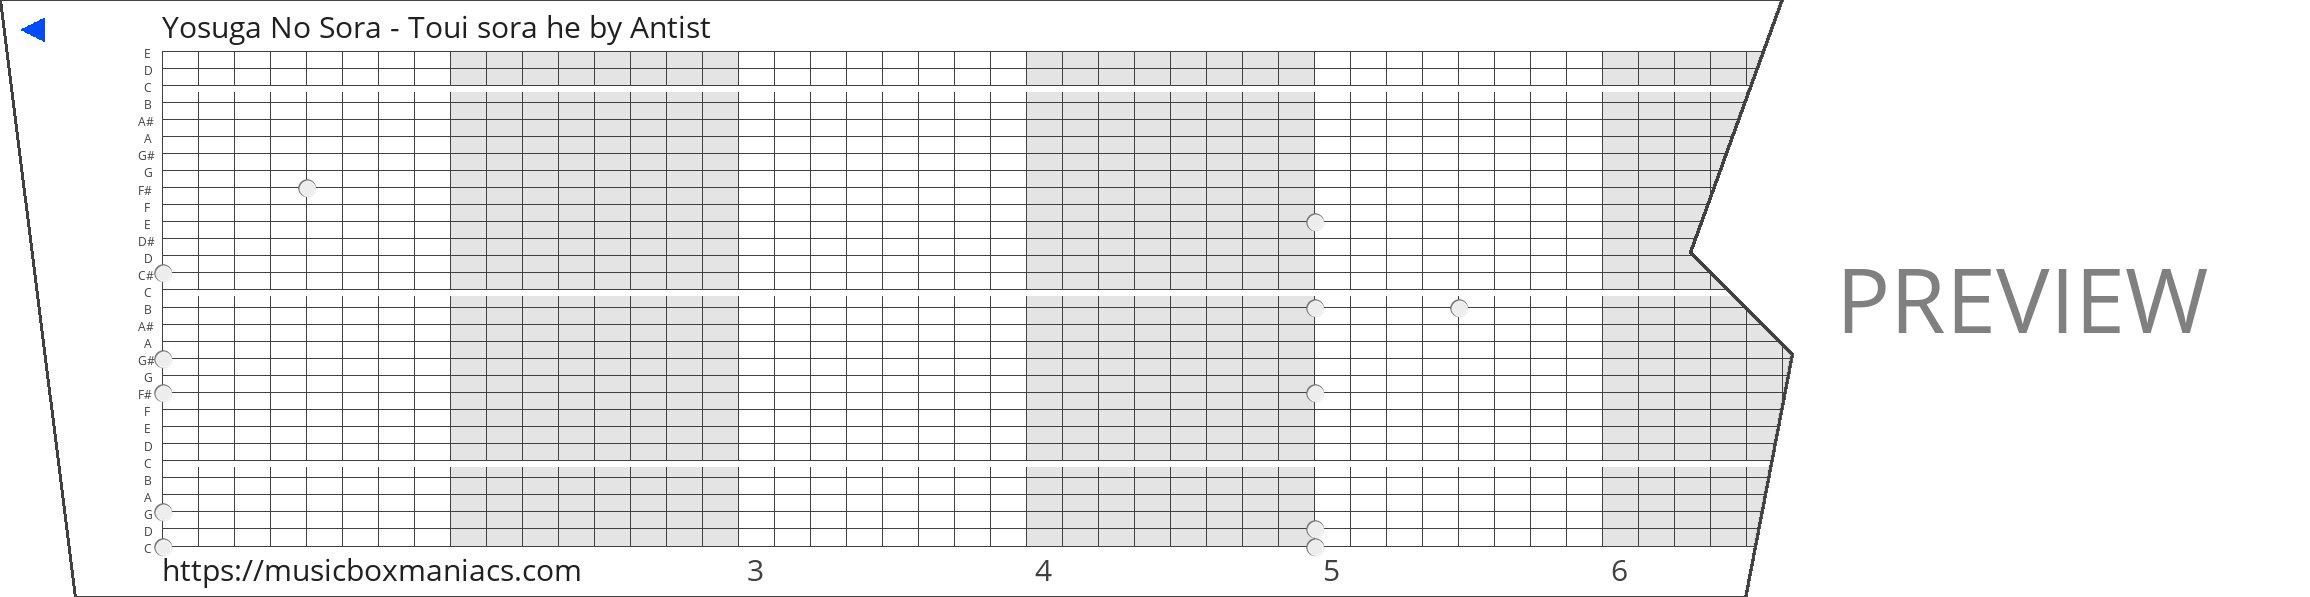 Yosuga No Sora - Toui sora he 30 note music box paper strip